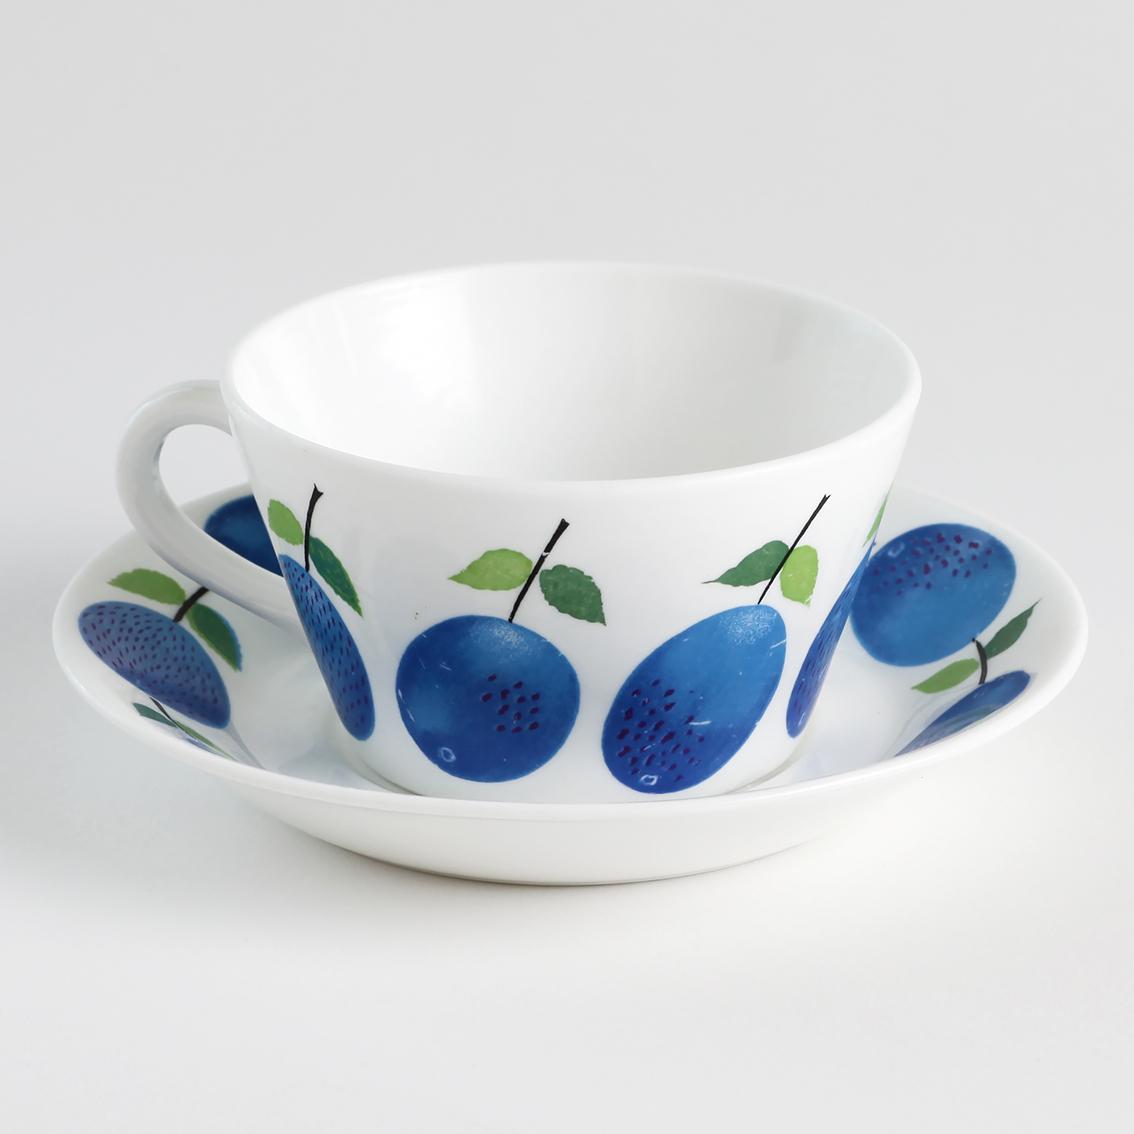 Gustavsberg グスタフスベリ Prunus プルーヌス ティーカップ&ソーサー - 5 北欧ヴィンテージ